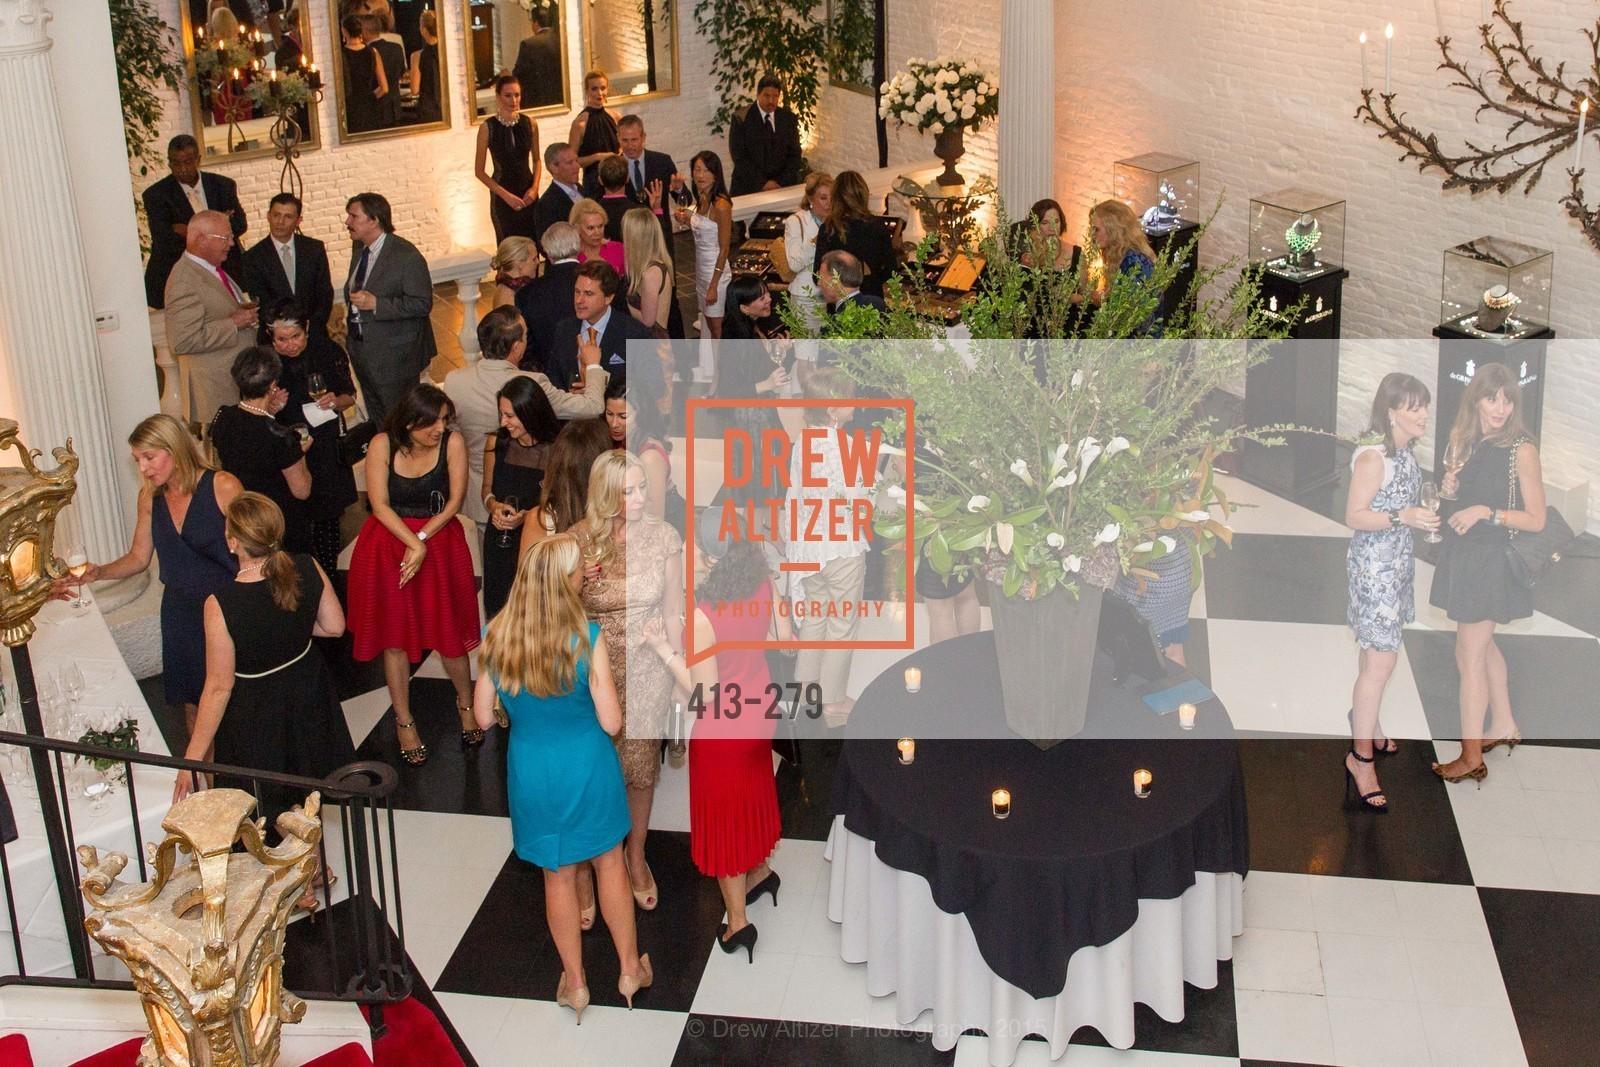 Atmosphere, De Grisogono Kicks off the Opera Opening, Villa Taverna, September 9th, 2015,Drew Altizer, Drew Altizer Photography, full-service agency, private events, San Francisco photographer, photographer california